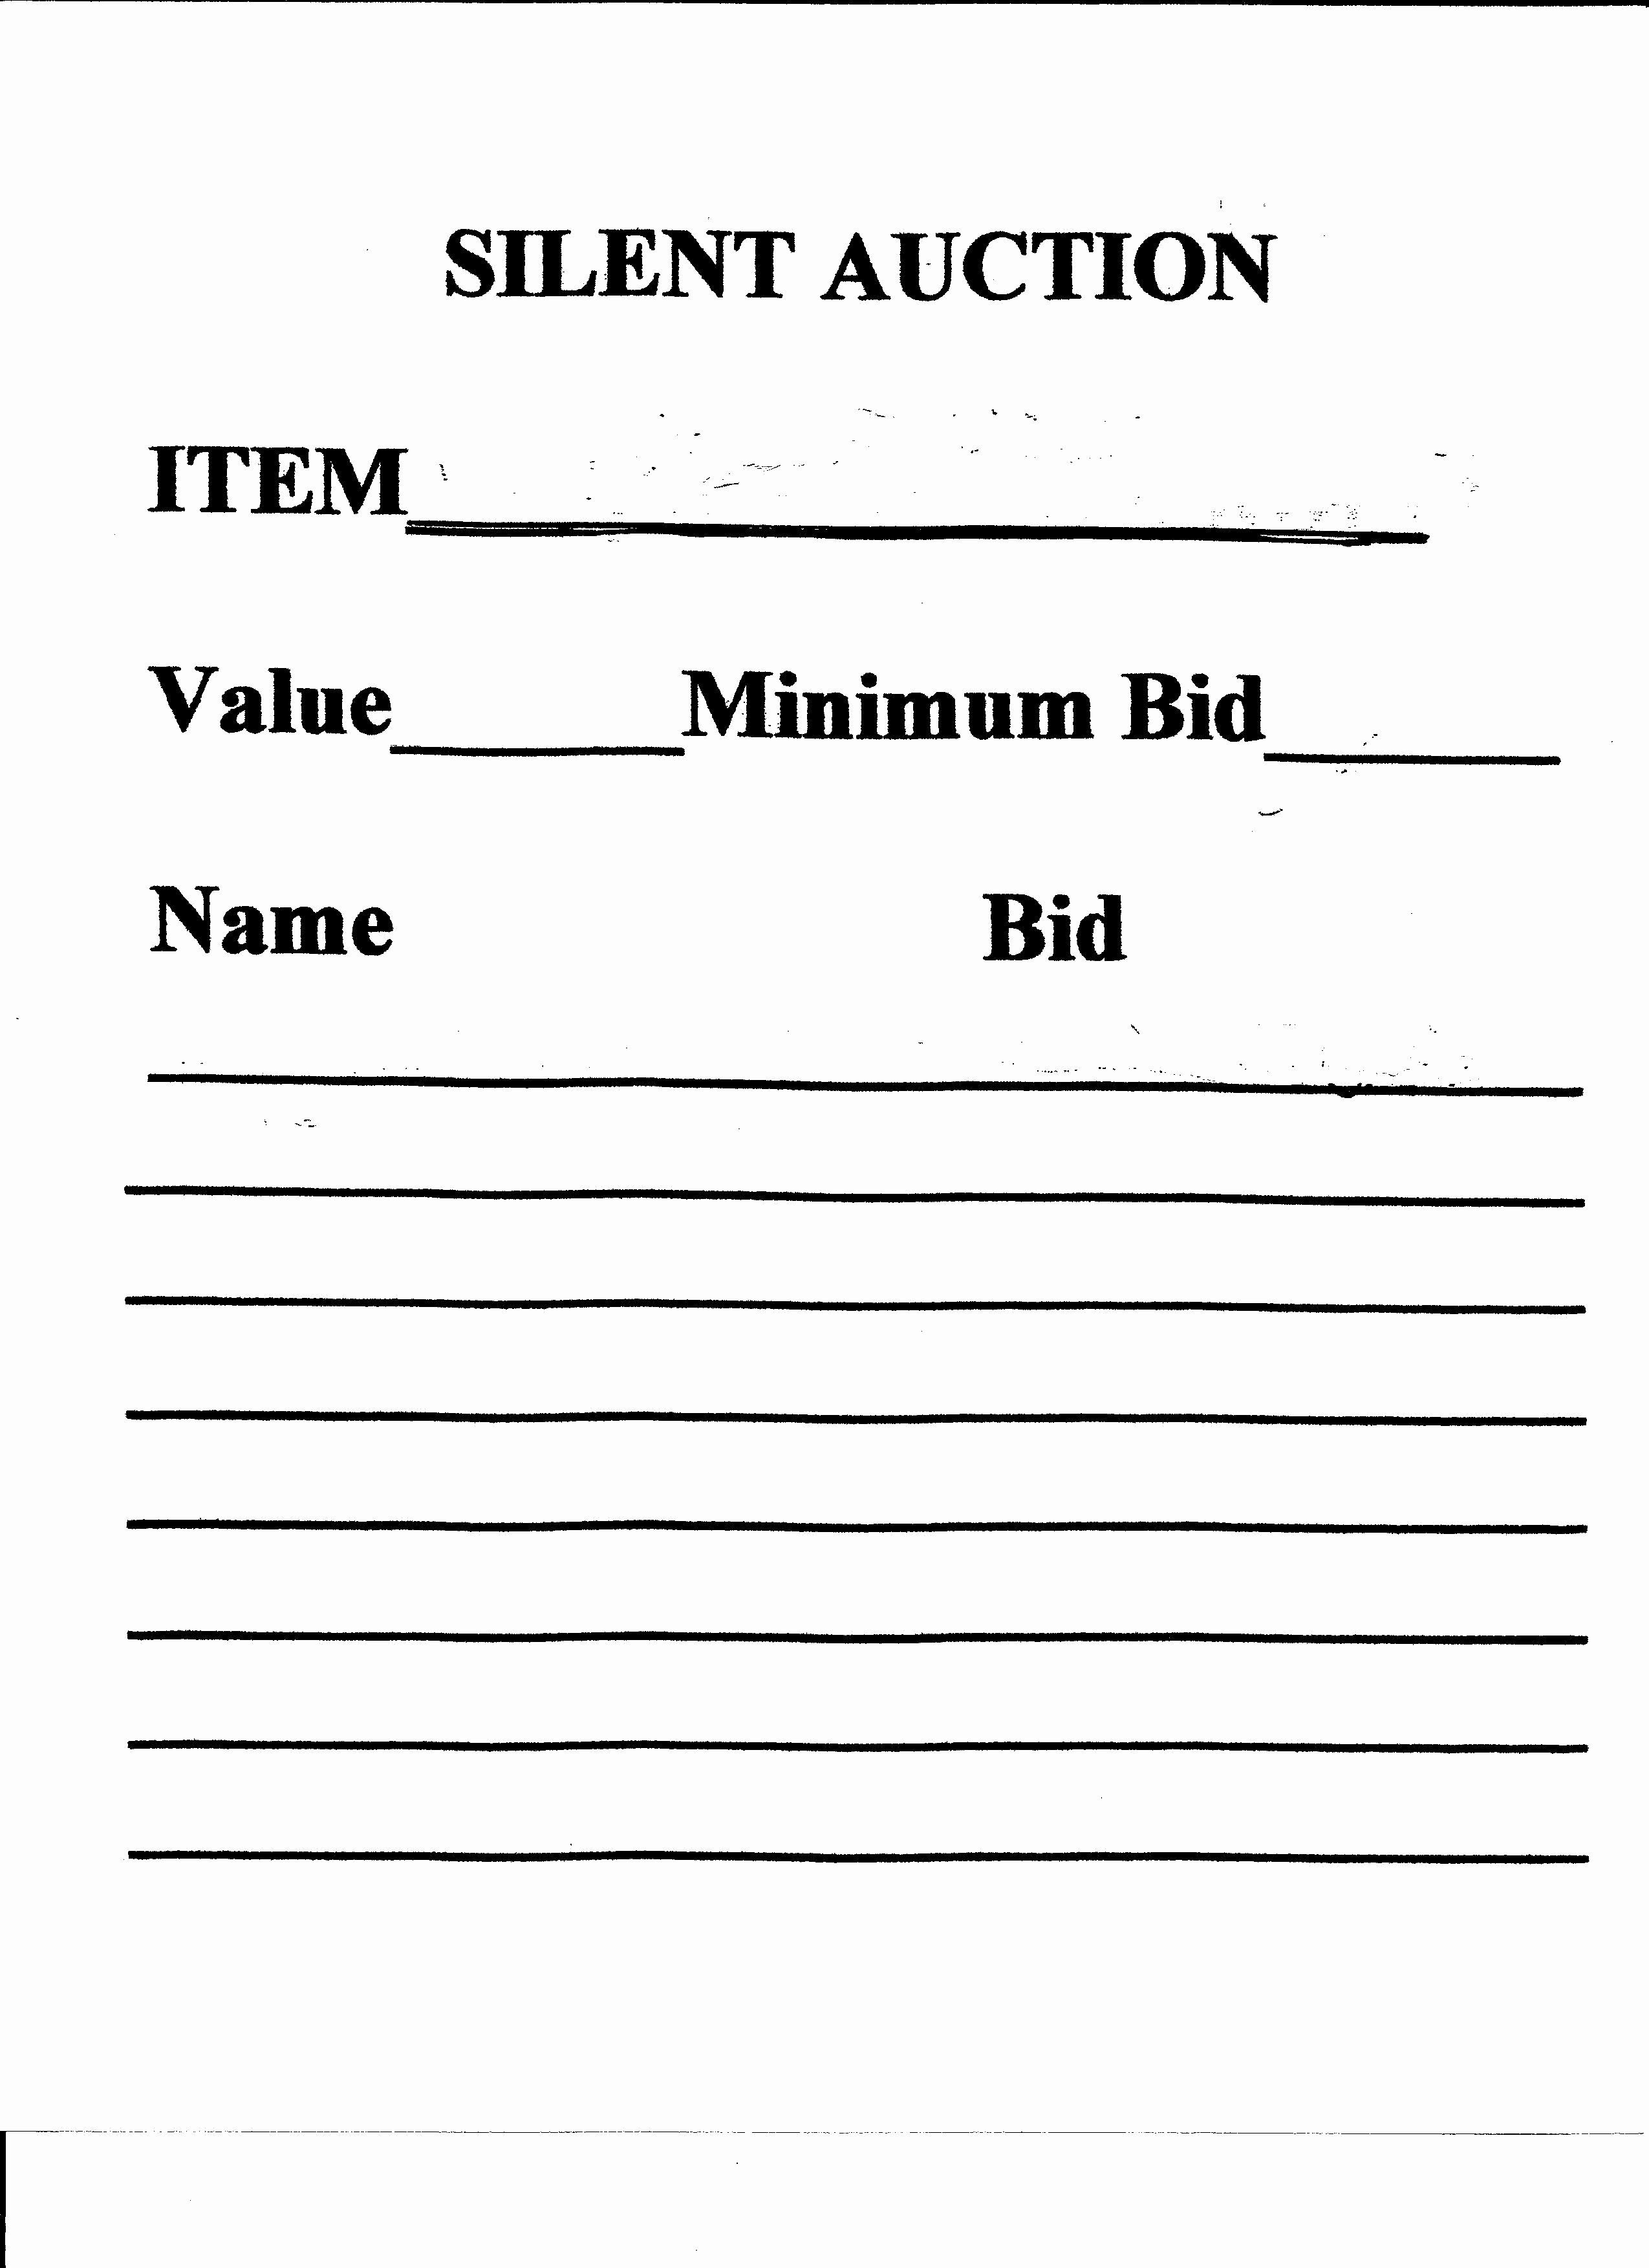 Silent Auction Receipt Template Best Of Silent Auction Form Special Events Pinterest Silent Auction Silent Auction Donations Silent Auction Bid Sheets